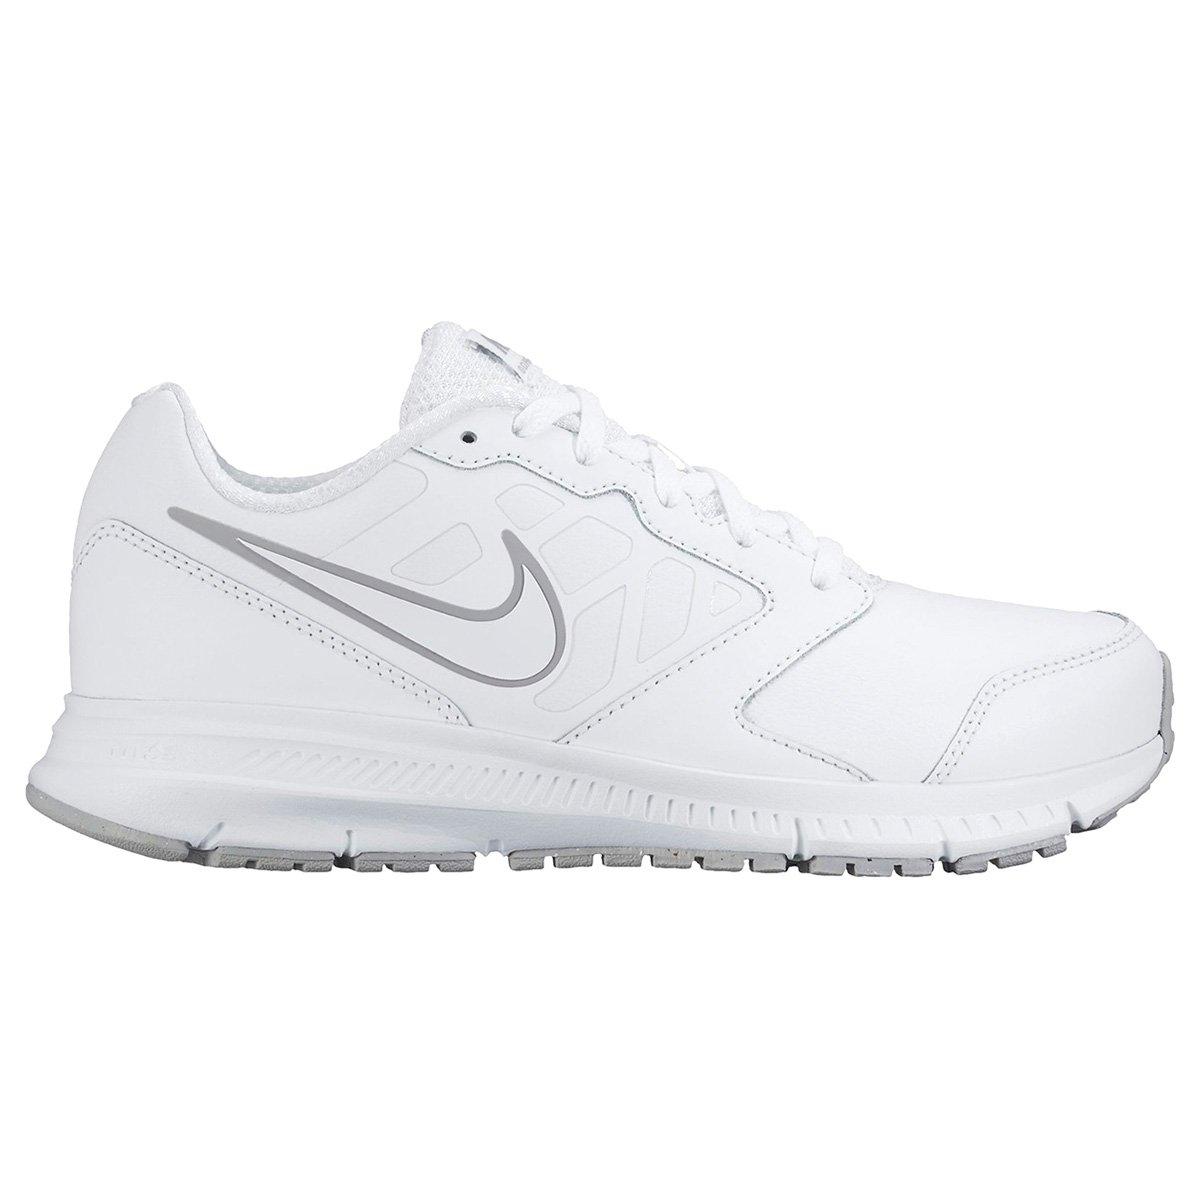 552dee196 Tênis Infantil Nike Downshifter 6 Masculino - Branco e Cinza - Compre Agora